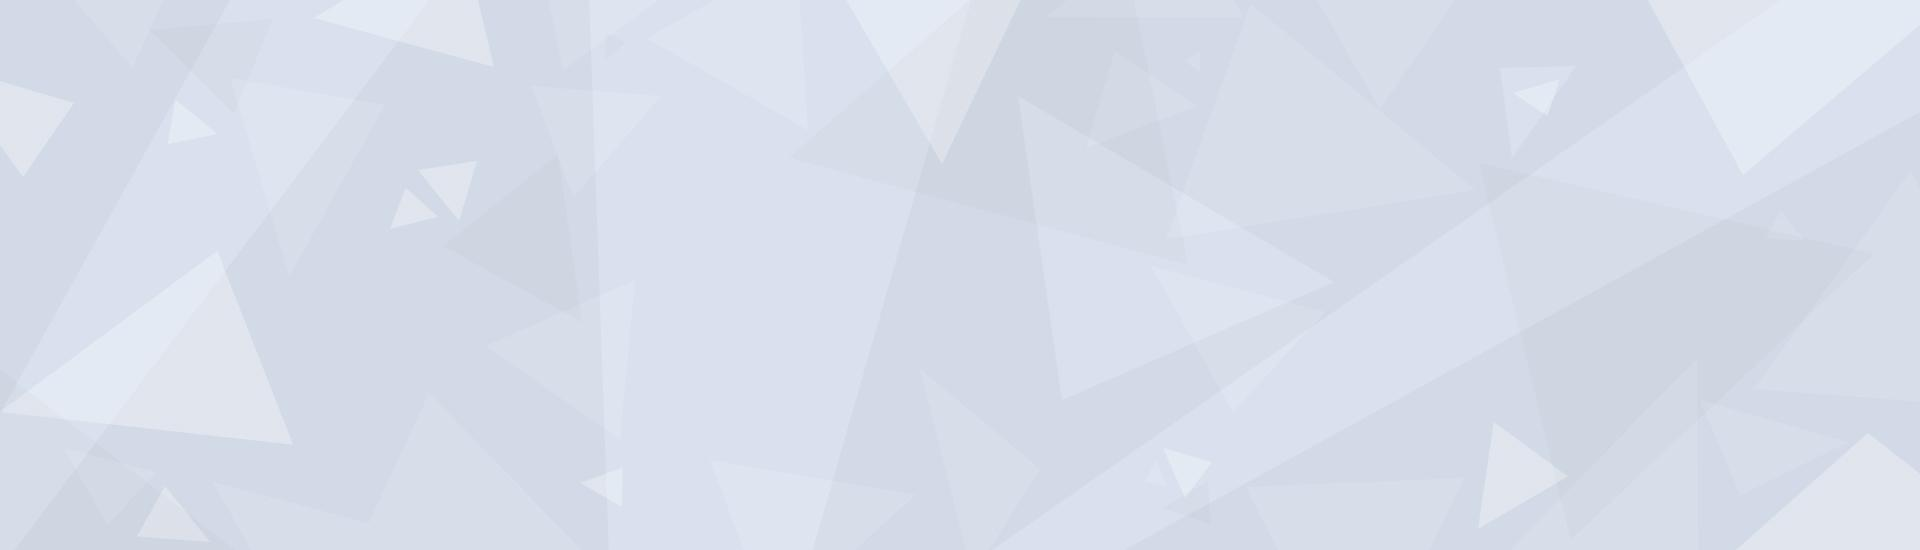 Team_Loco Team - VSLeague Online eSport